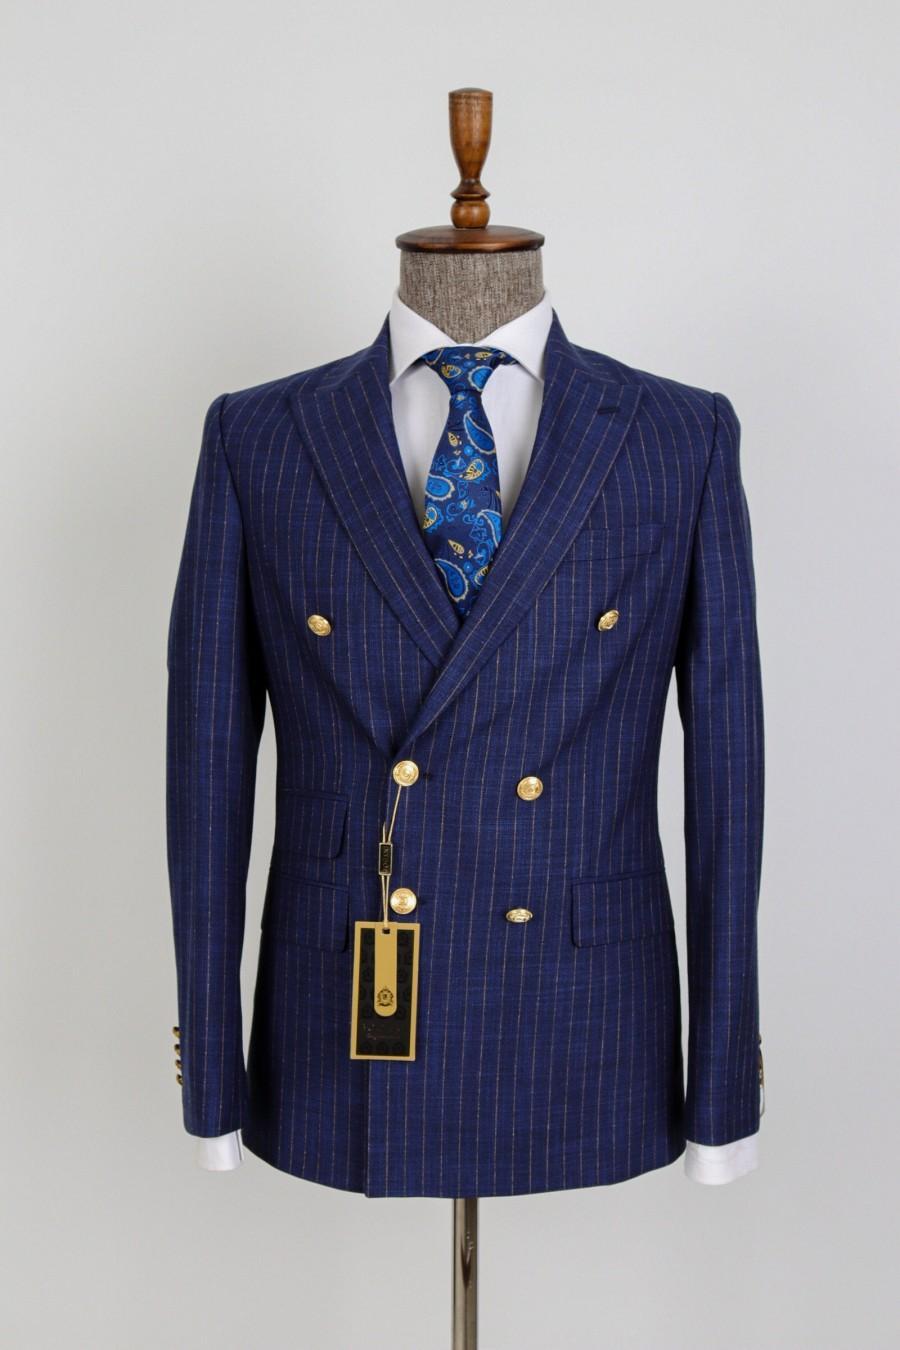 Wedding - Double Breasted Striped - Golden Button Men Suit Desginer Bespoke Suit